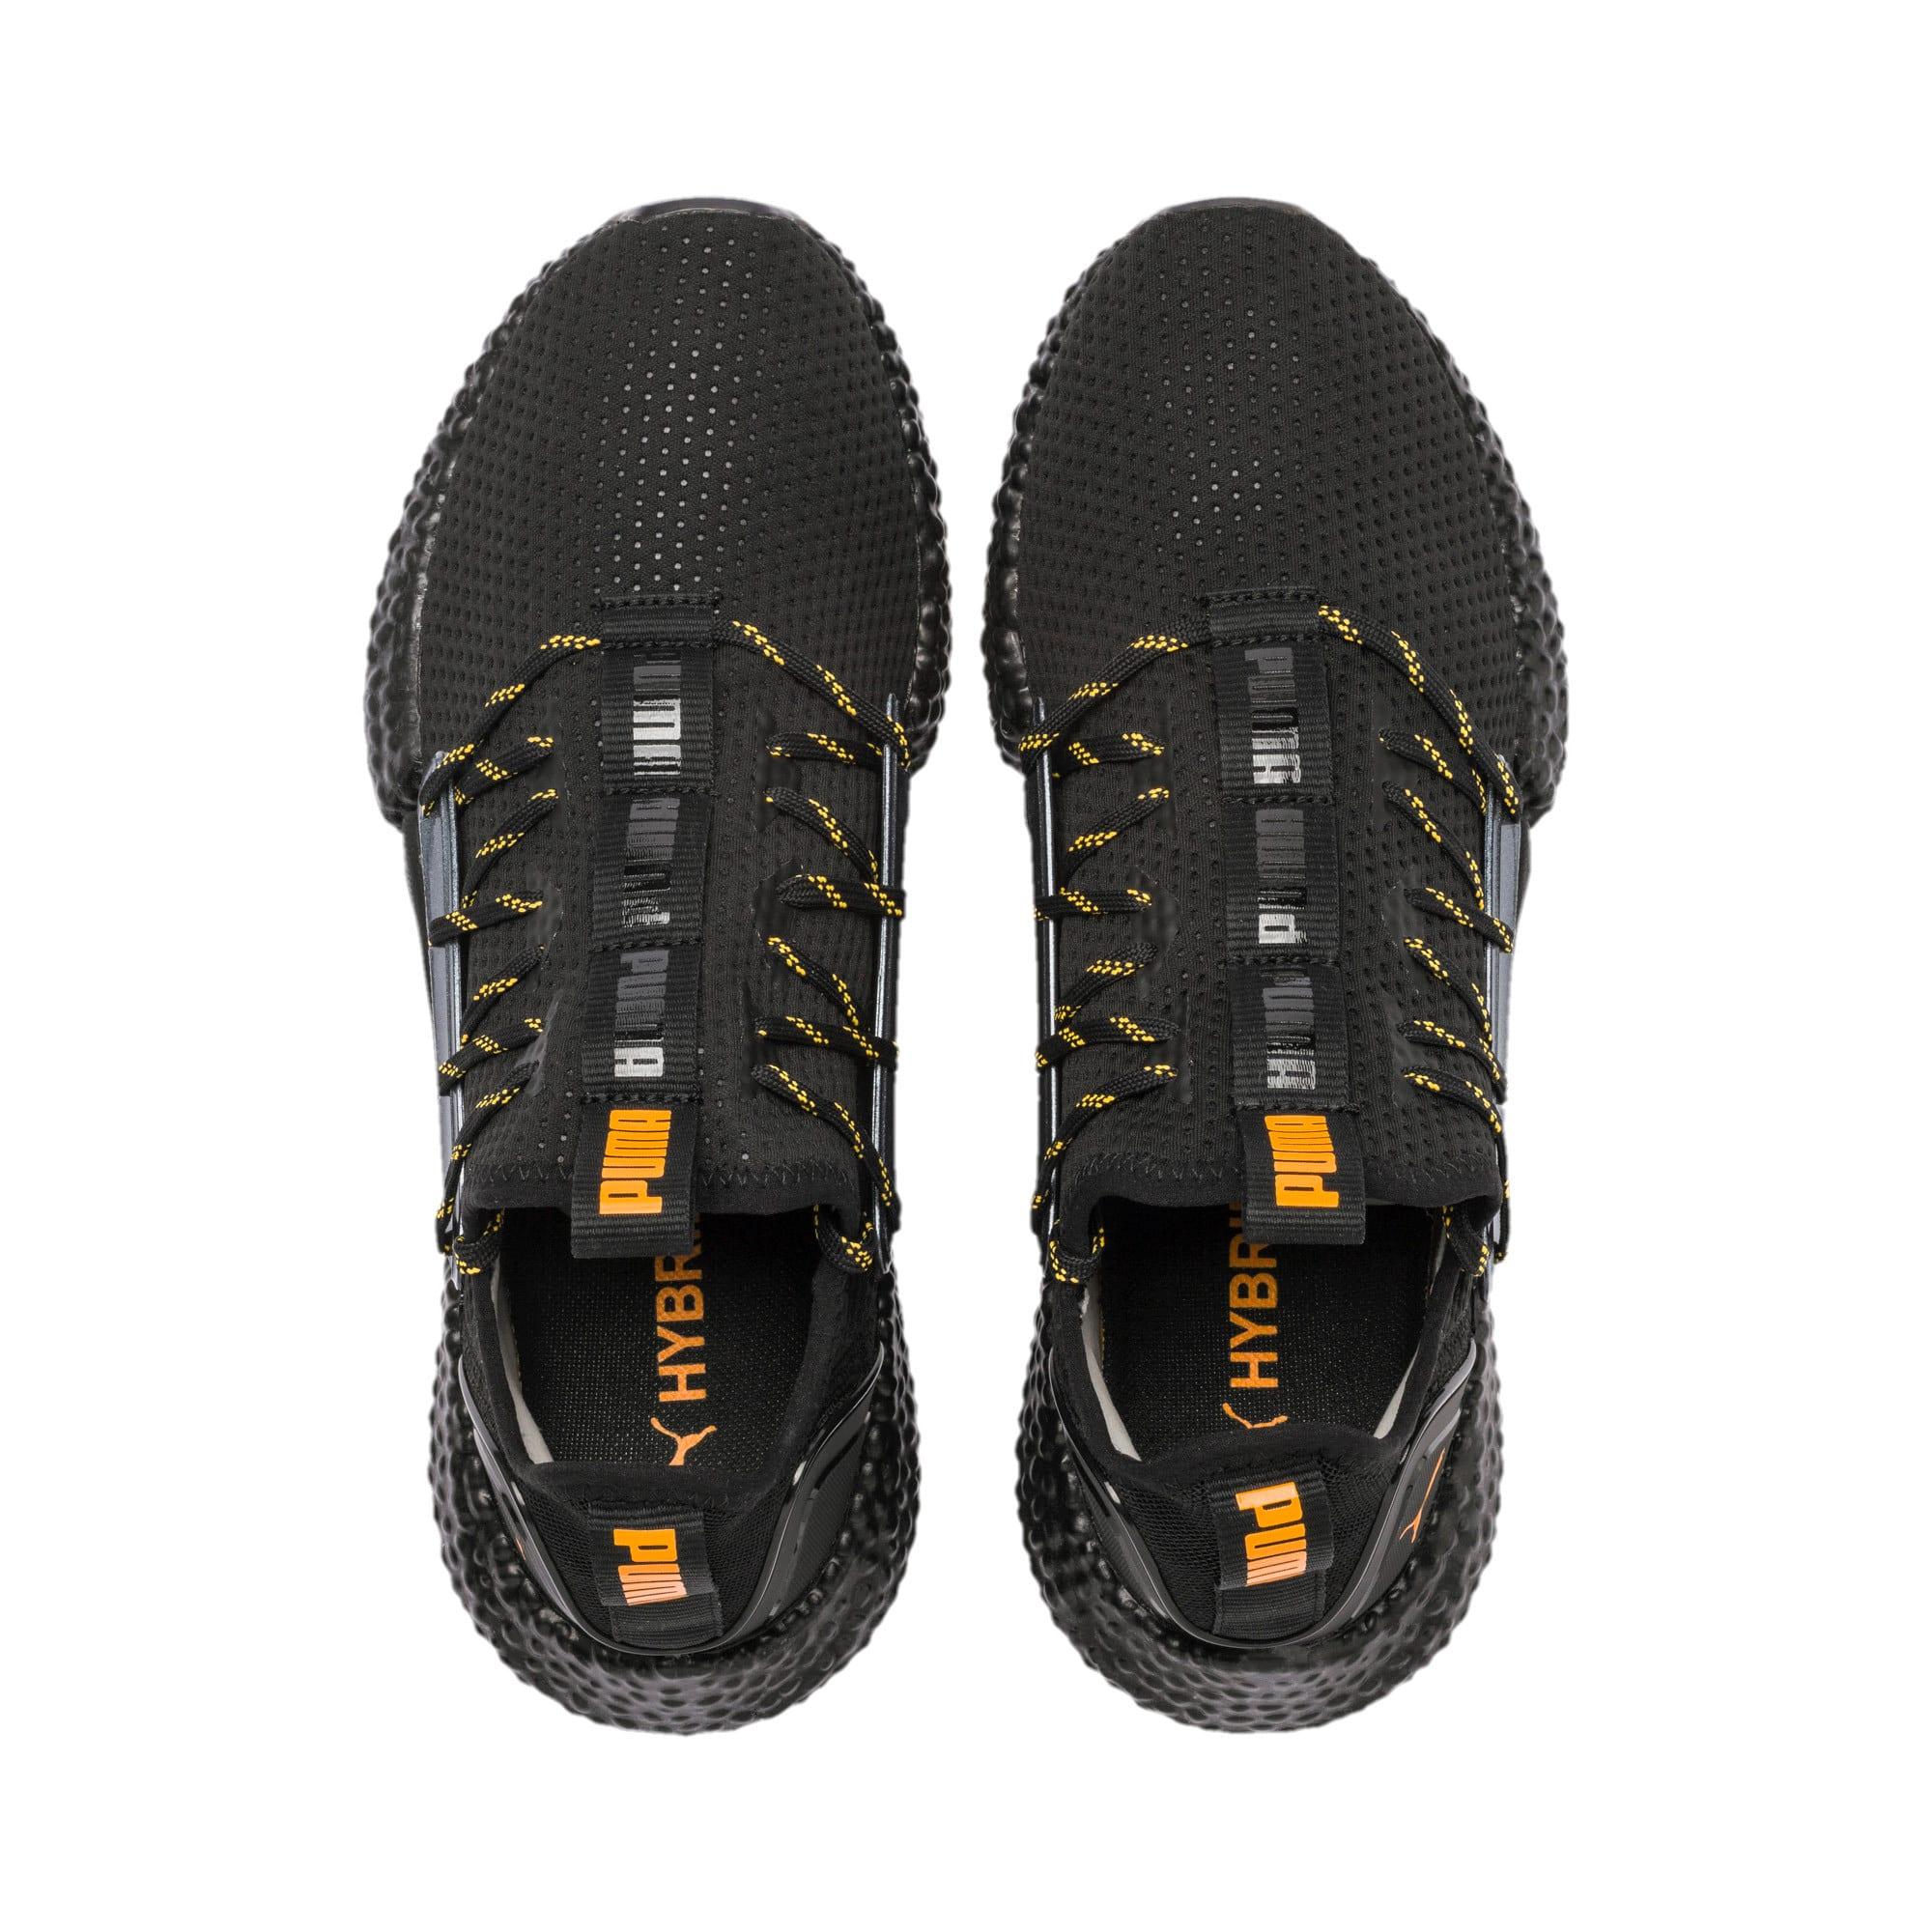 Thumbnail 7 of HYBRID Rocket Aero Men's Running Shoes, Puma Black-Puma Black, medium